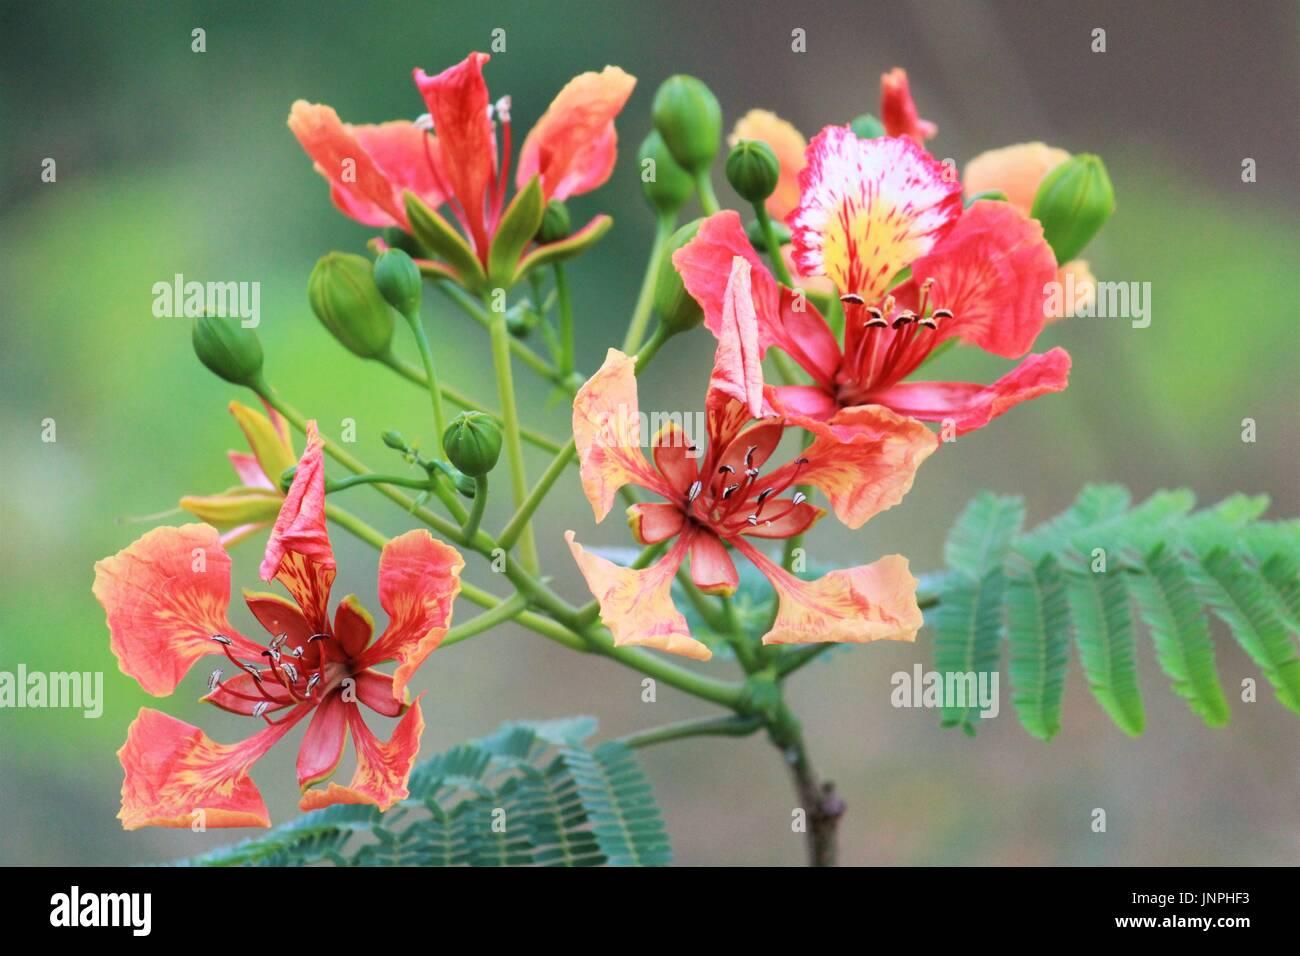 Tropical Blooming Hibiscus Flower Arrangement Stock Photos